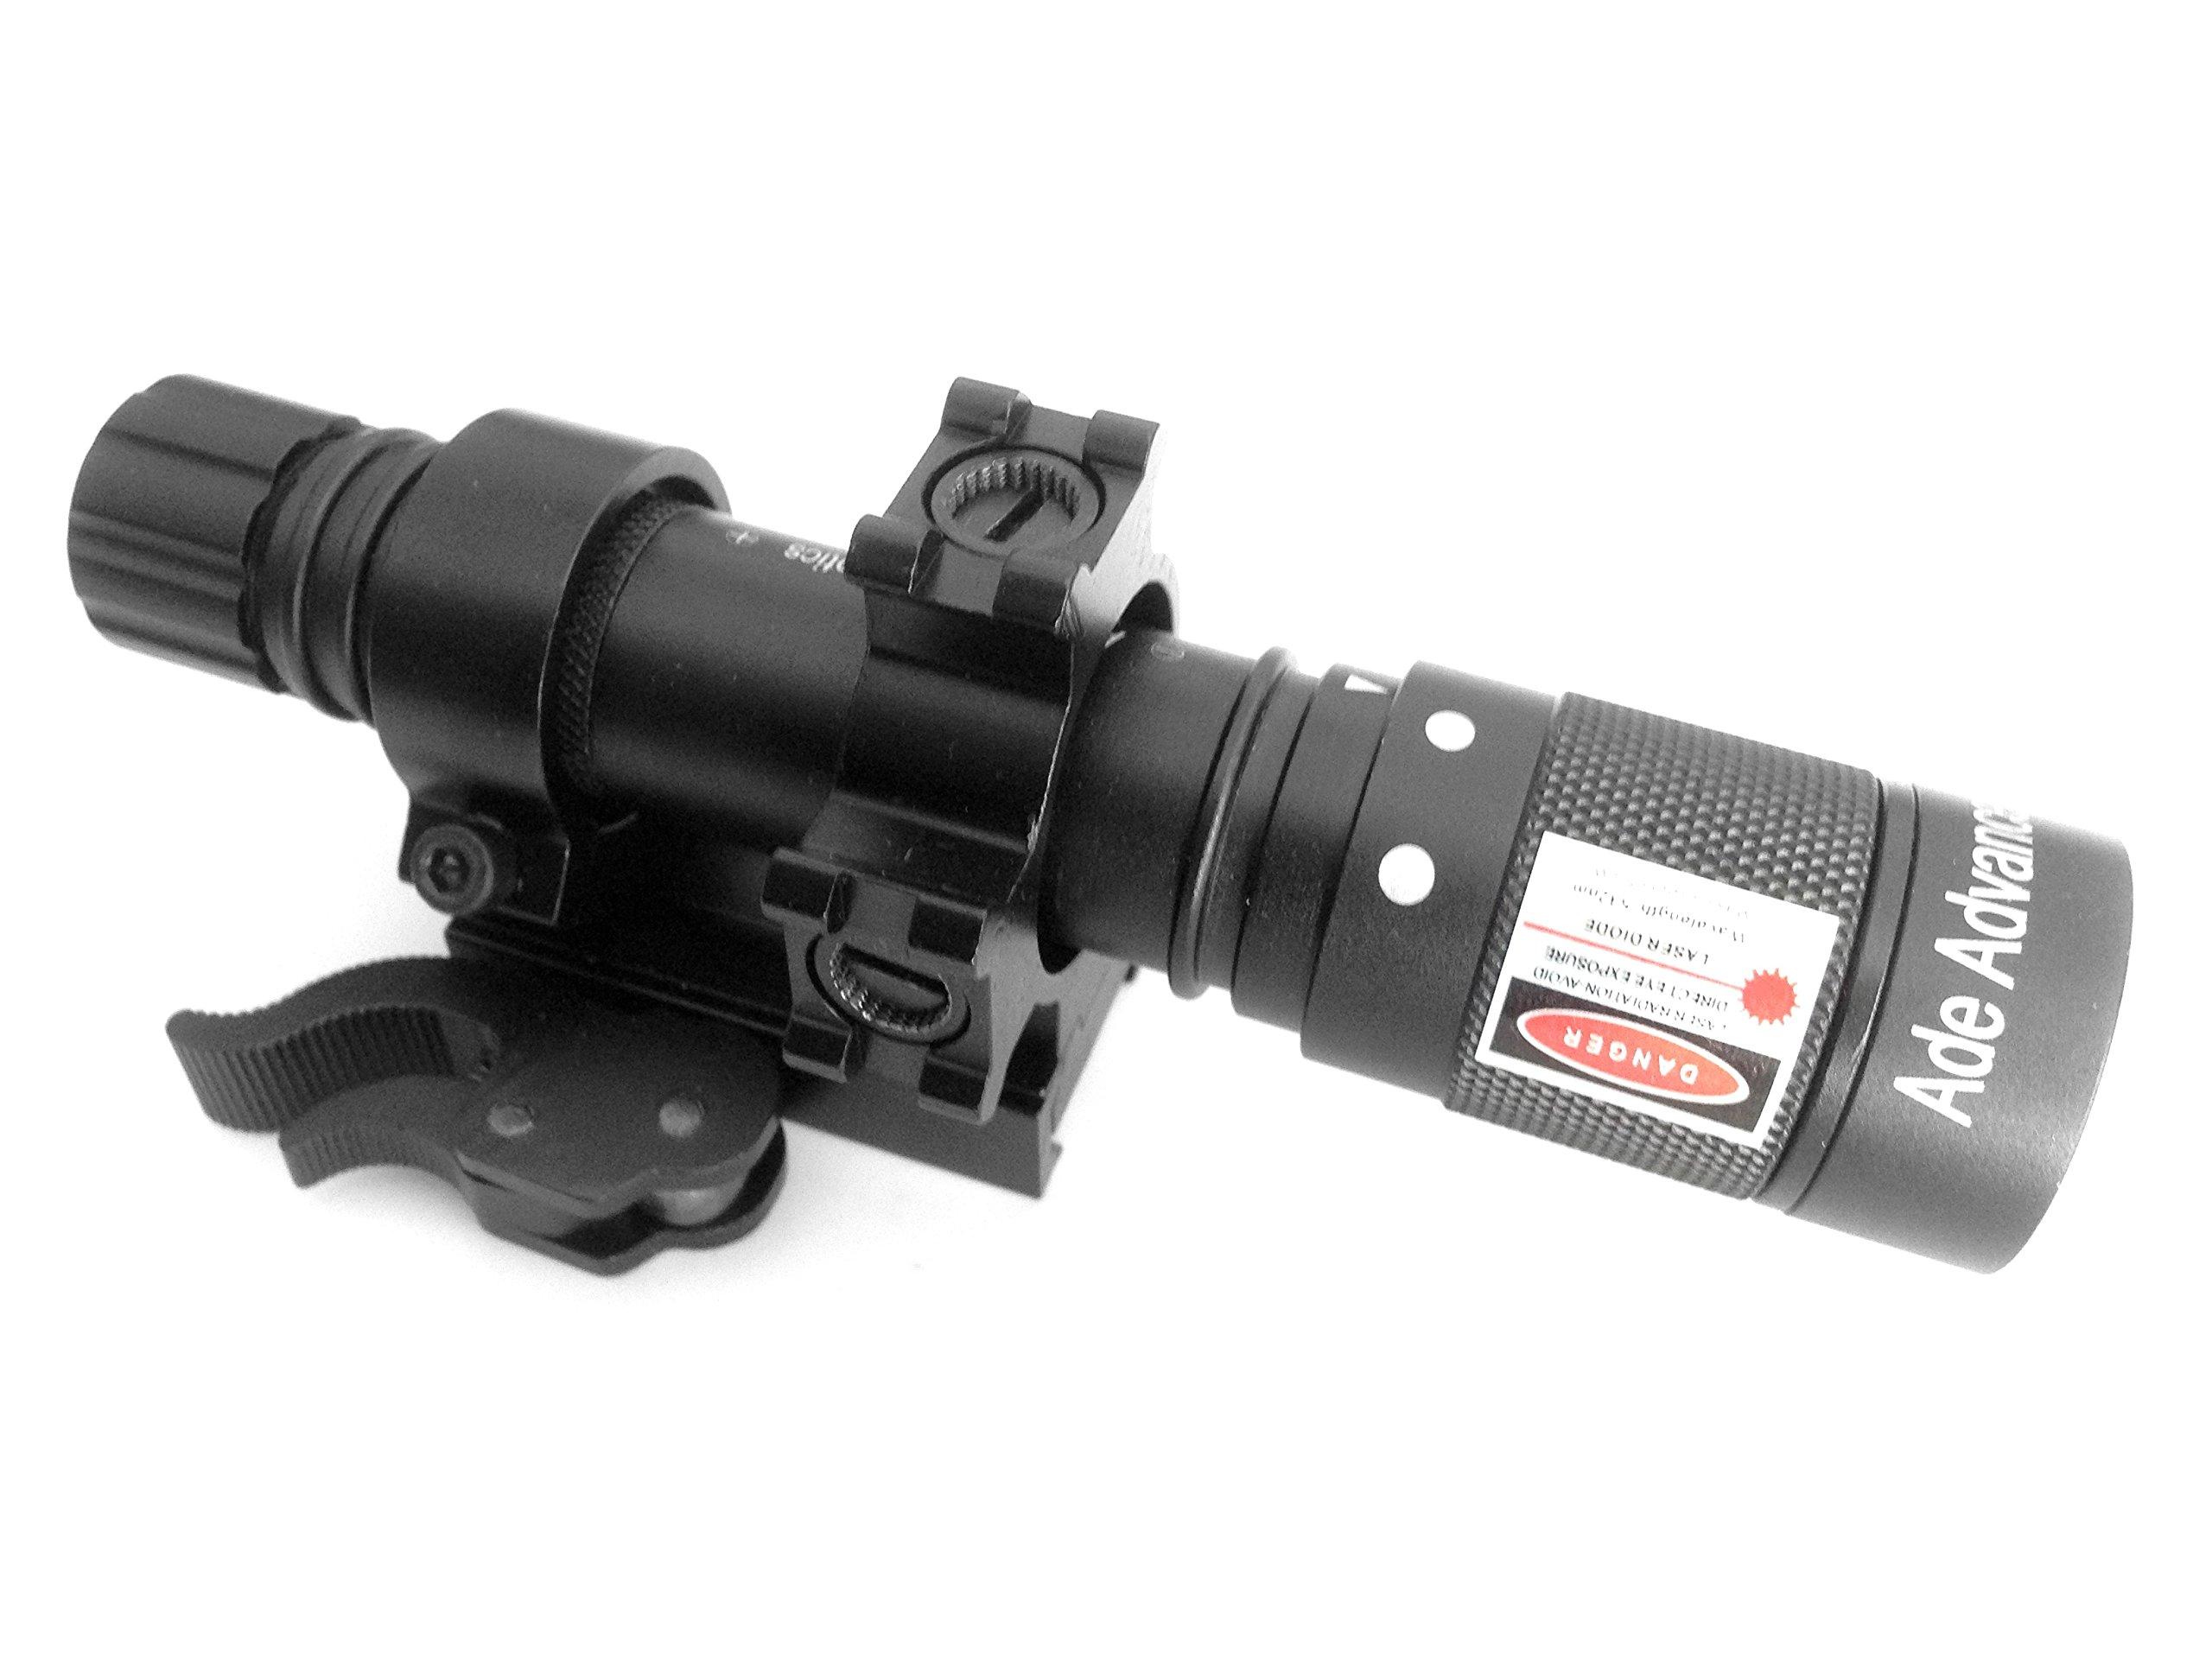 Ade Advanced Optics Adjustable Green Laser Flashlight Designator Illuminator Switch and QD Mount, Class IIIR laser product, <5mW power output by Ade Advanced Optics